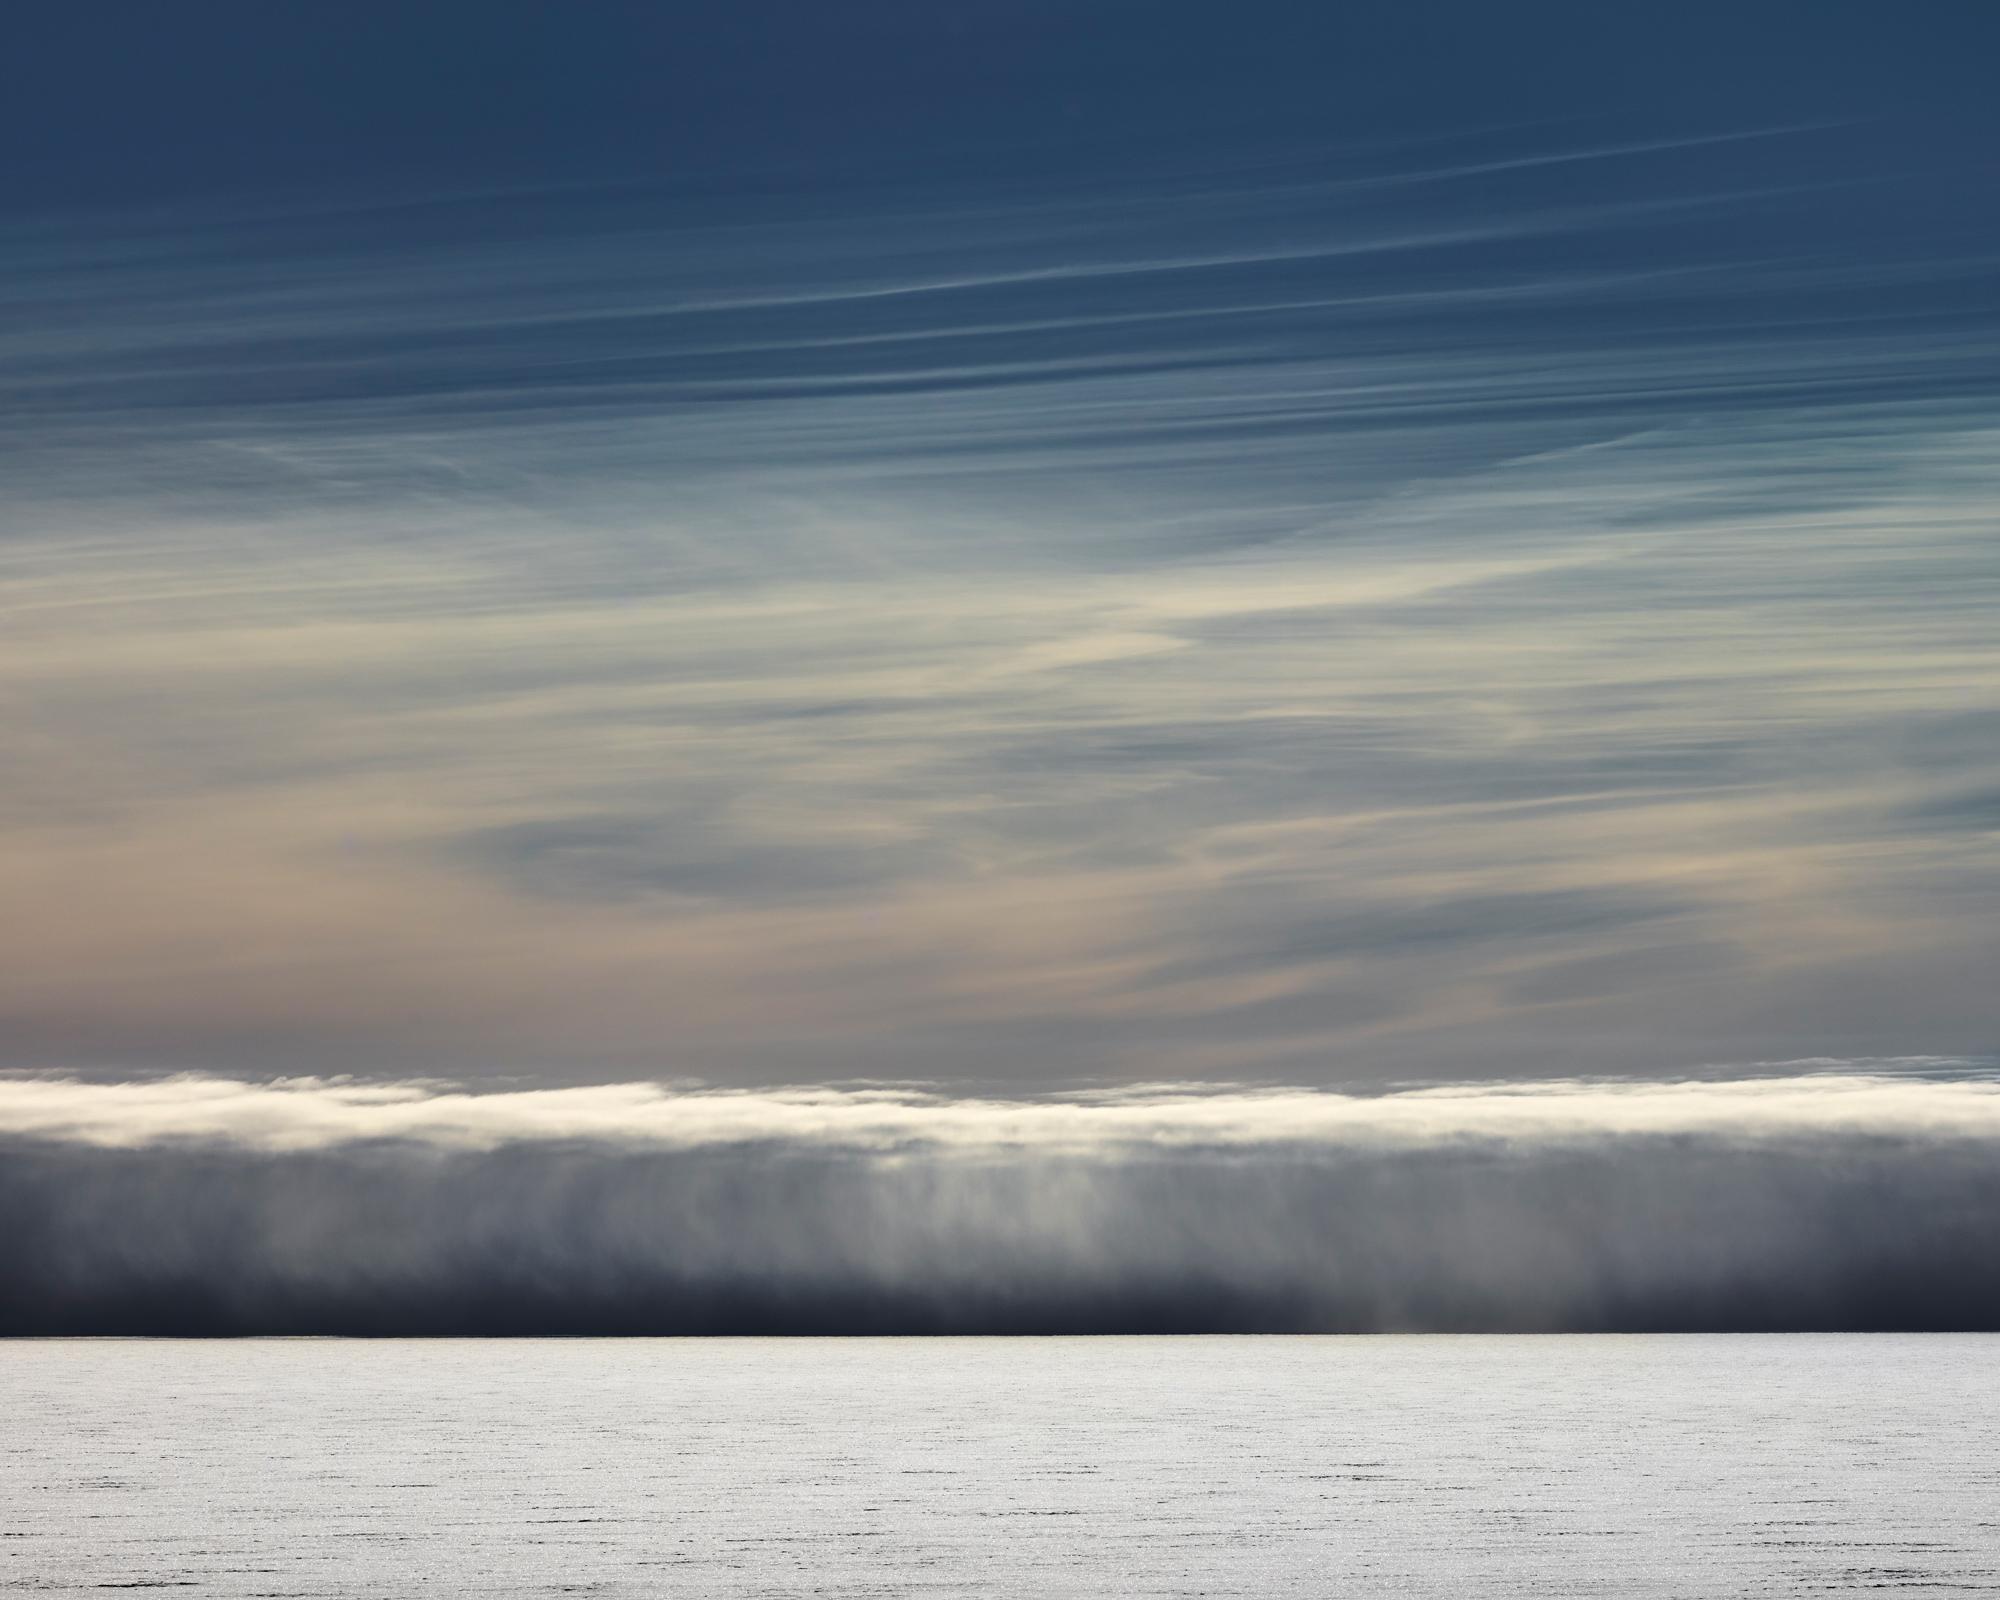 Icesheet #5649, 120cm x 150cm, Digital Pigment Print, Edition of 7, 2013